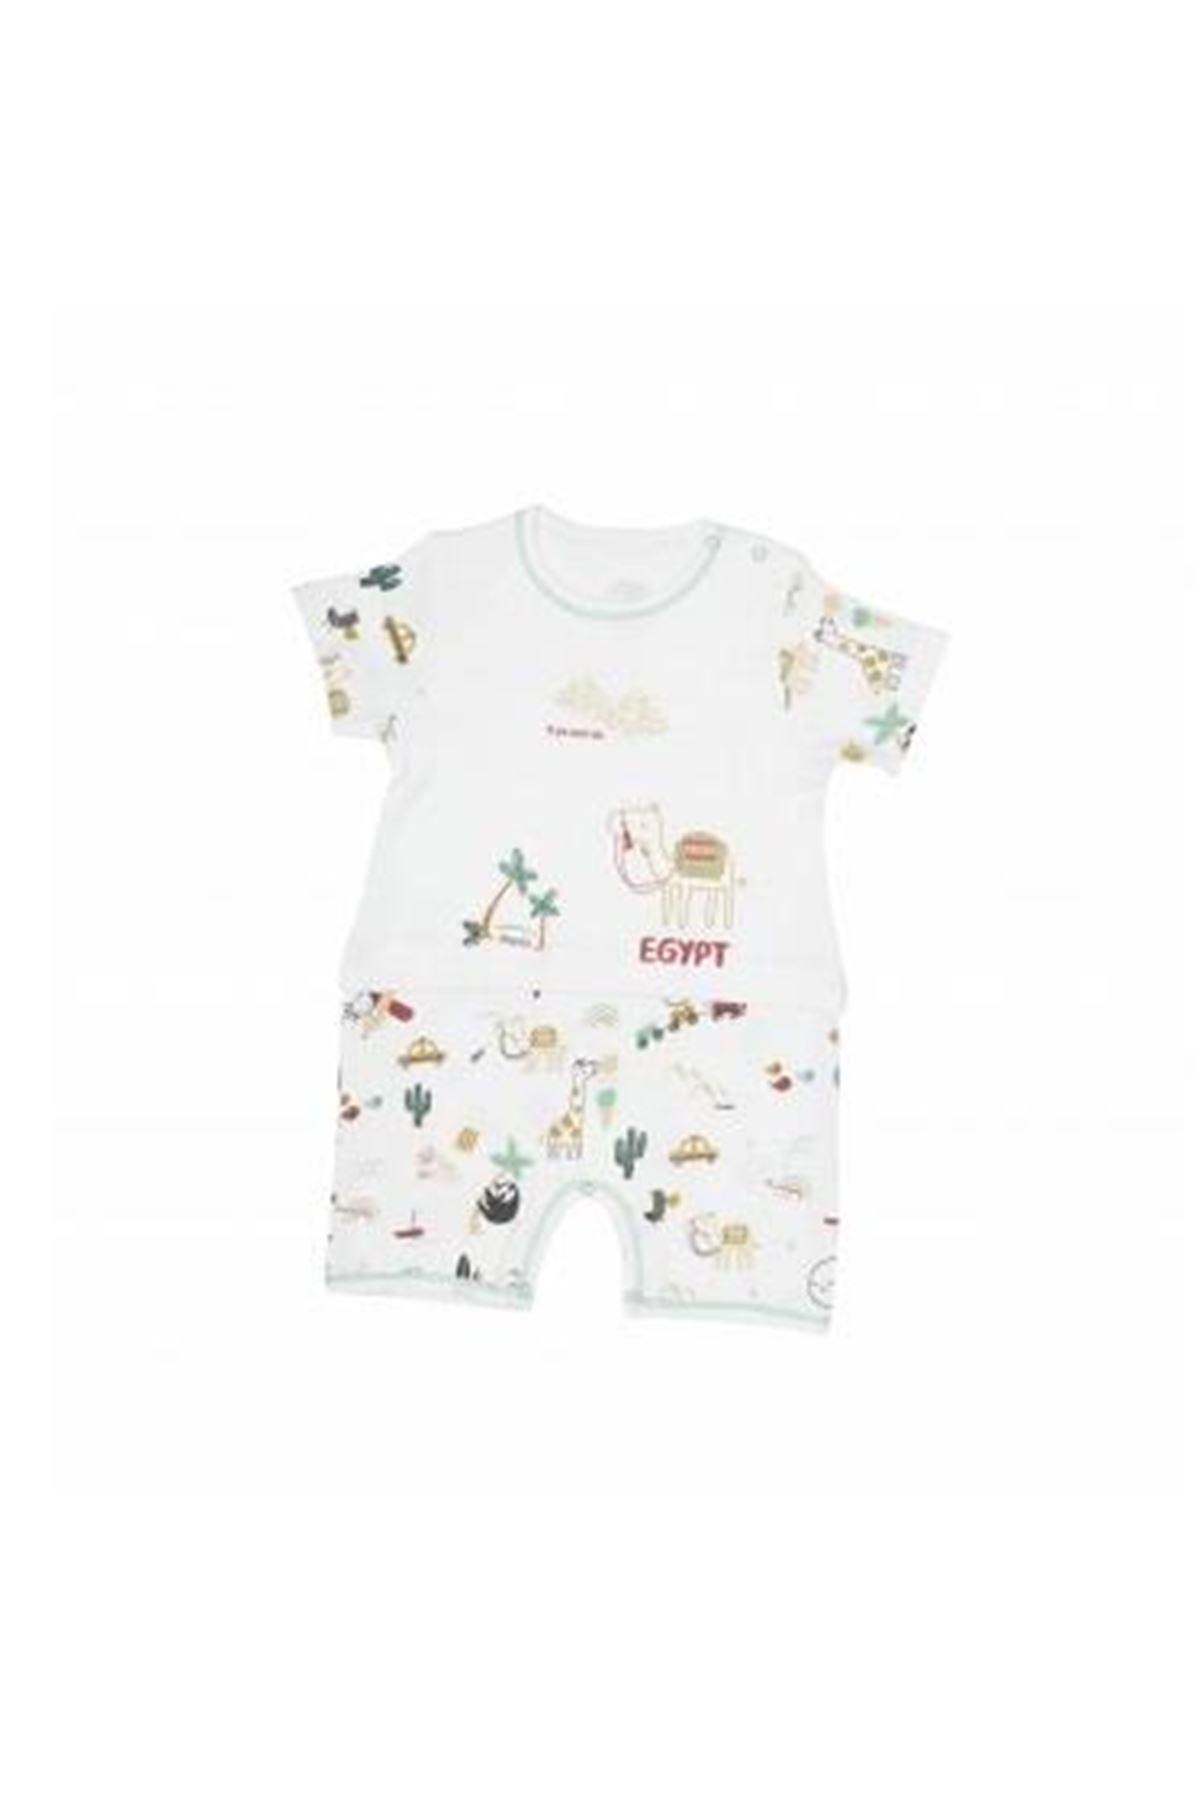 Luggi Baby Kısa Kol Bebe Tulum 5055 Orjinal